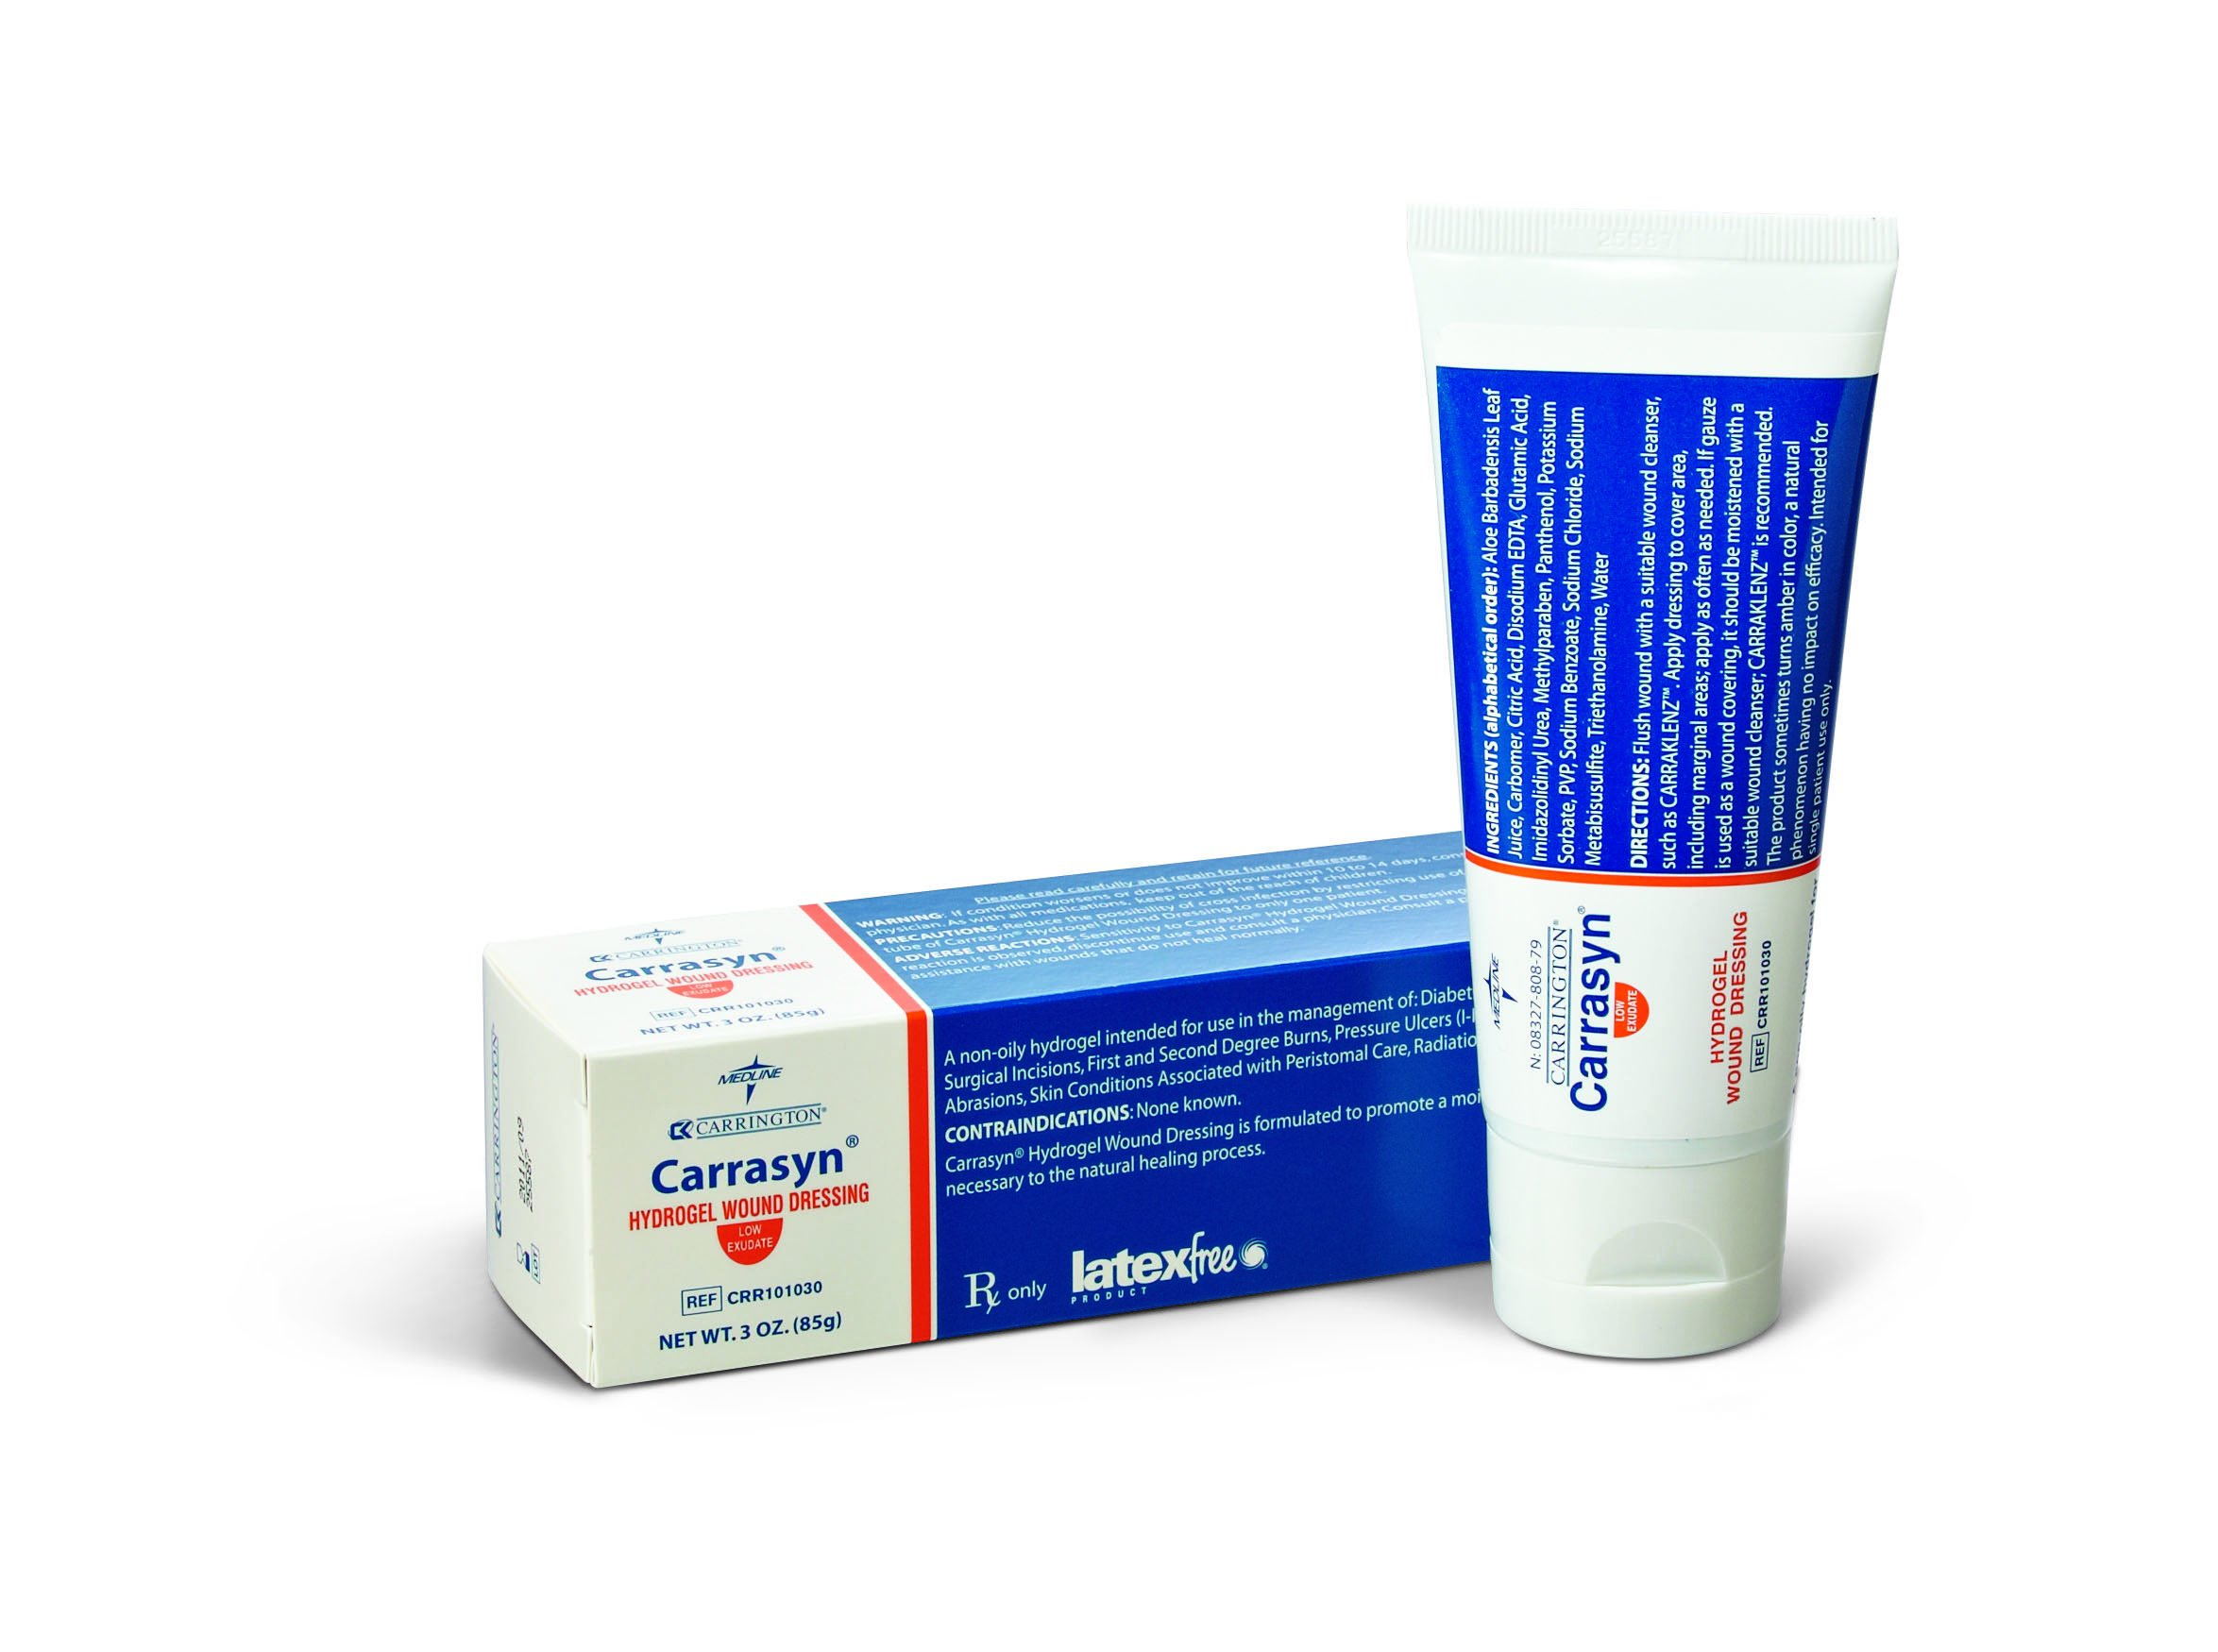 Medline Industries CRR101030 Carrasyn Hydrogel, 3 oz Tube, 12 Pack (Pack of 12)